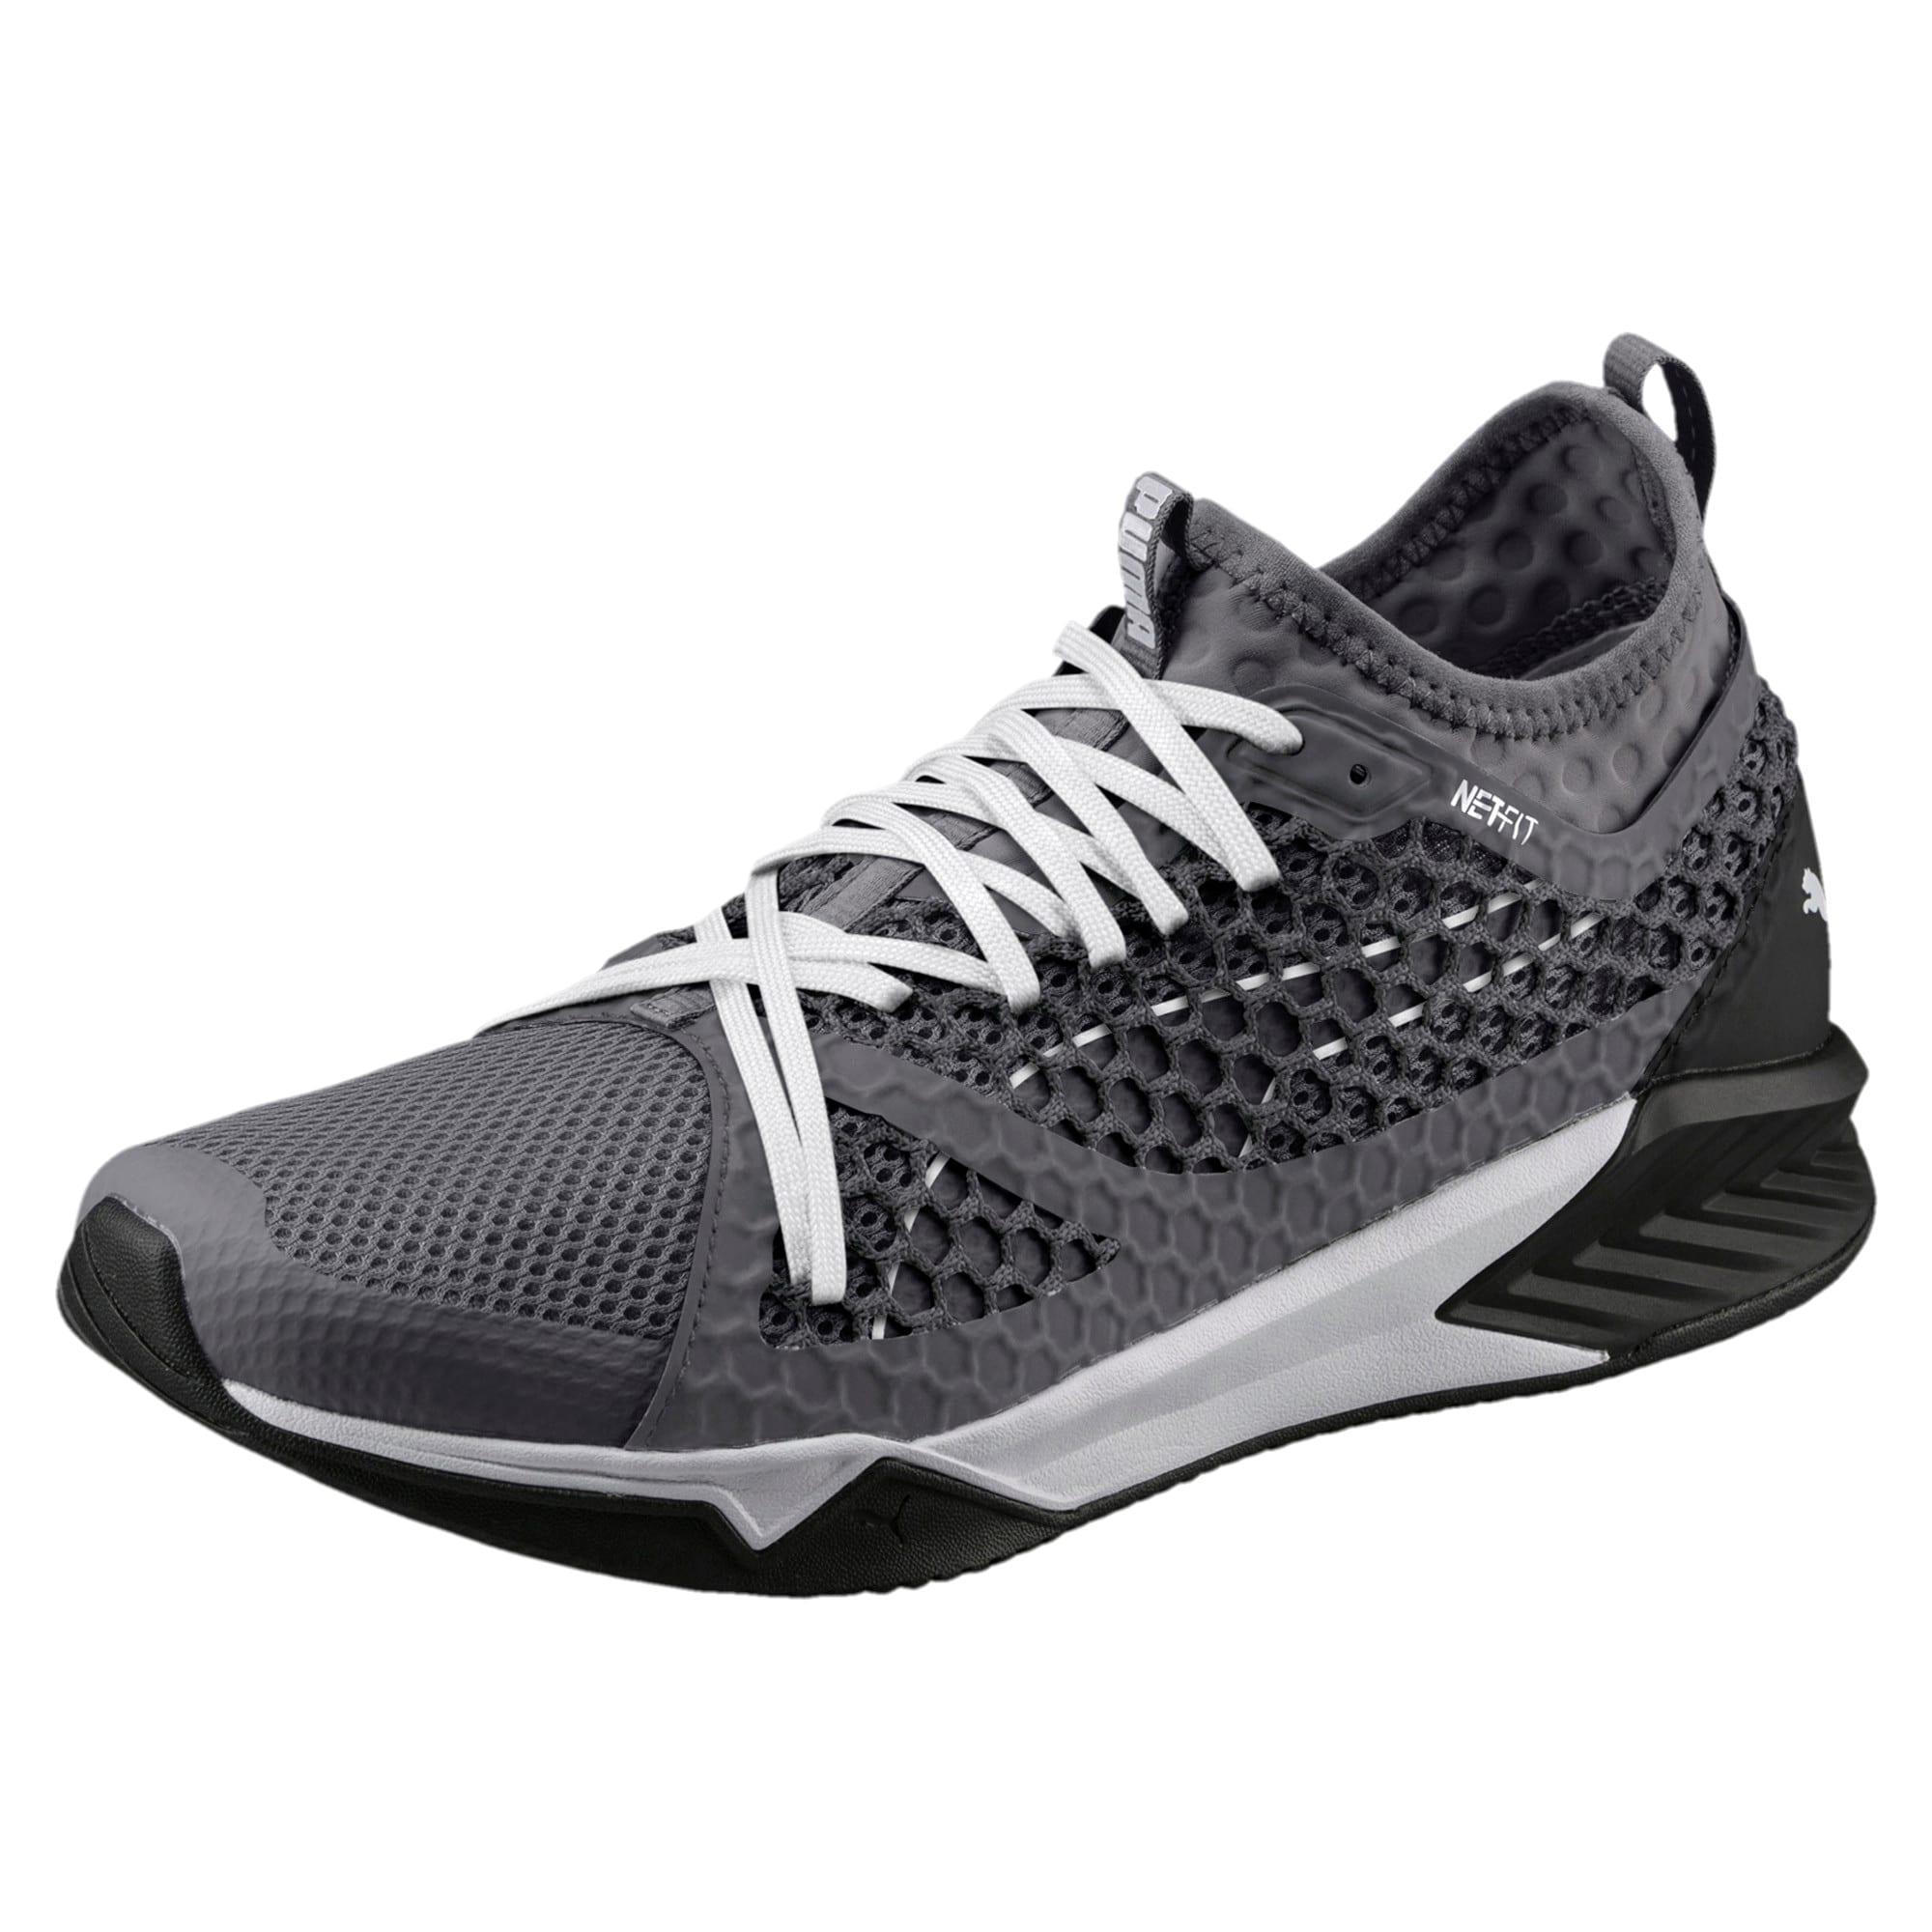 Thumbnail 1 of IGNITE XT NETFIT Men's Training Shoes, QUIET SHADE-Puma Black, medium-IND